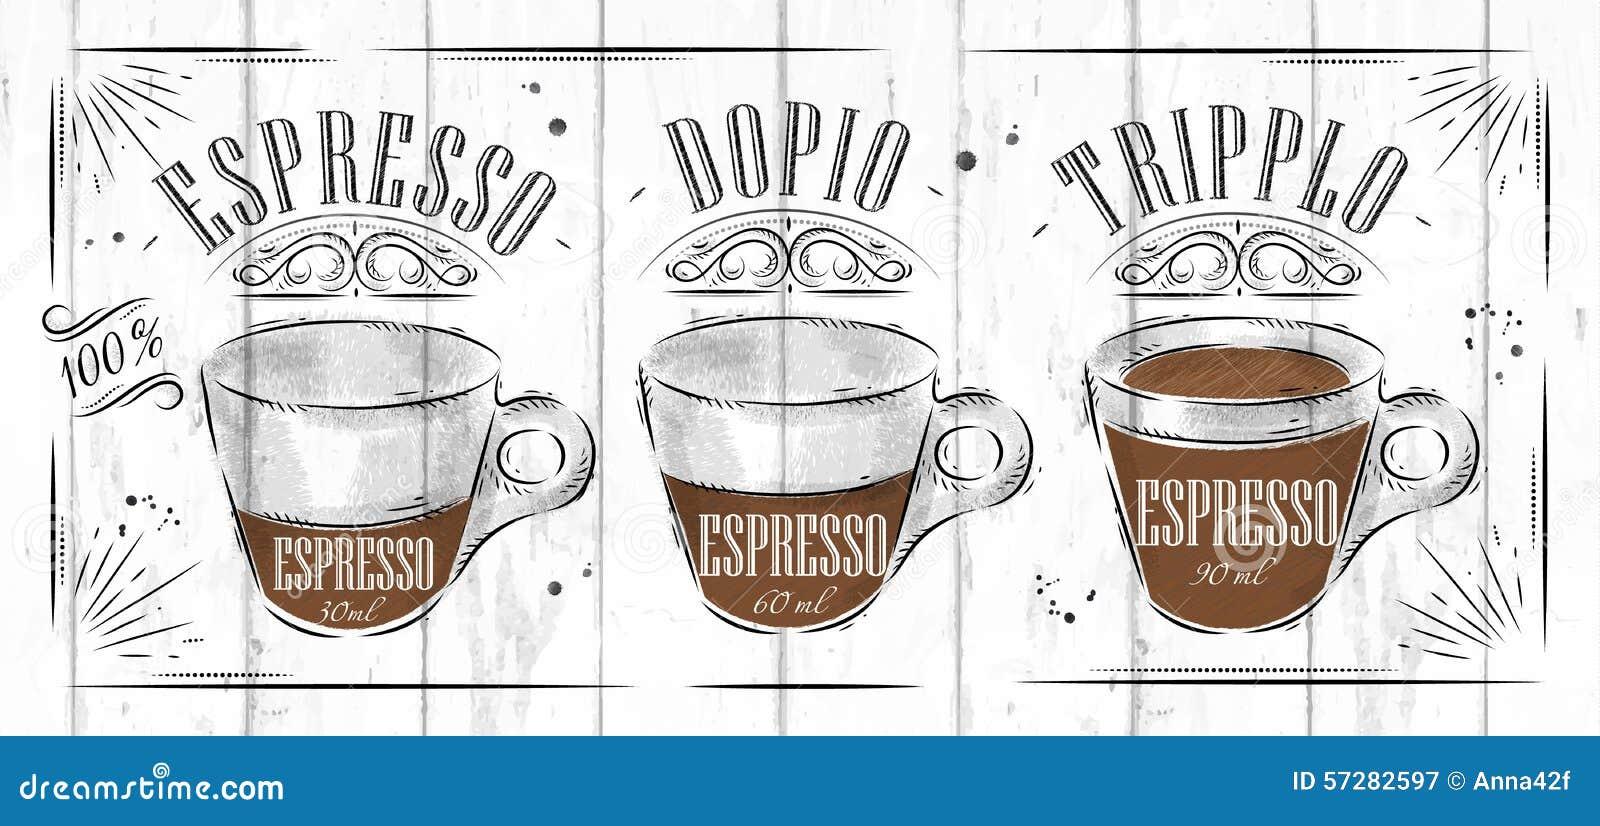 Poster Espresso Stock Vector - Image: 57282597